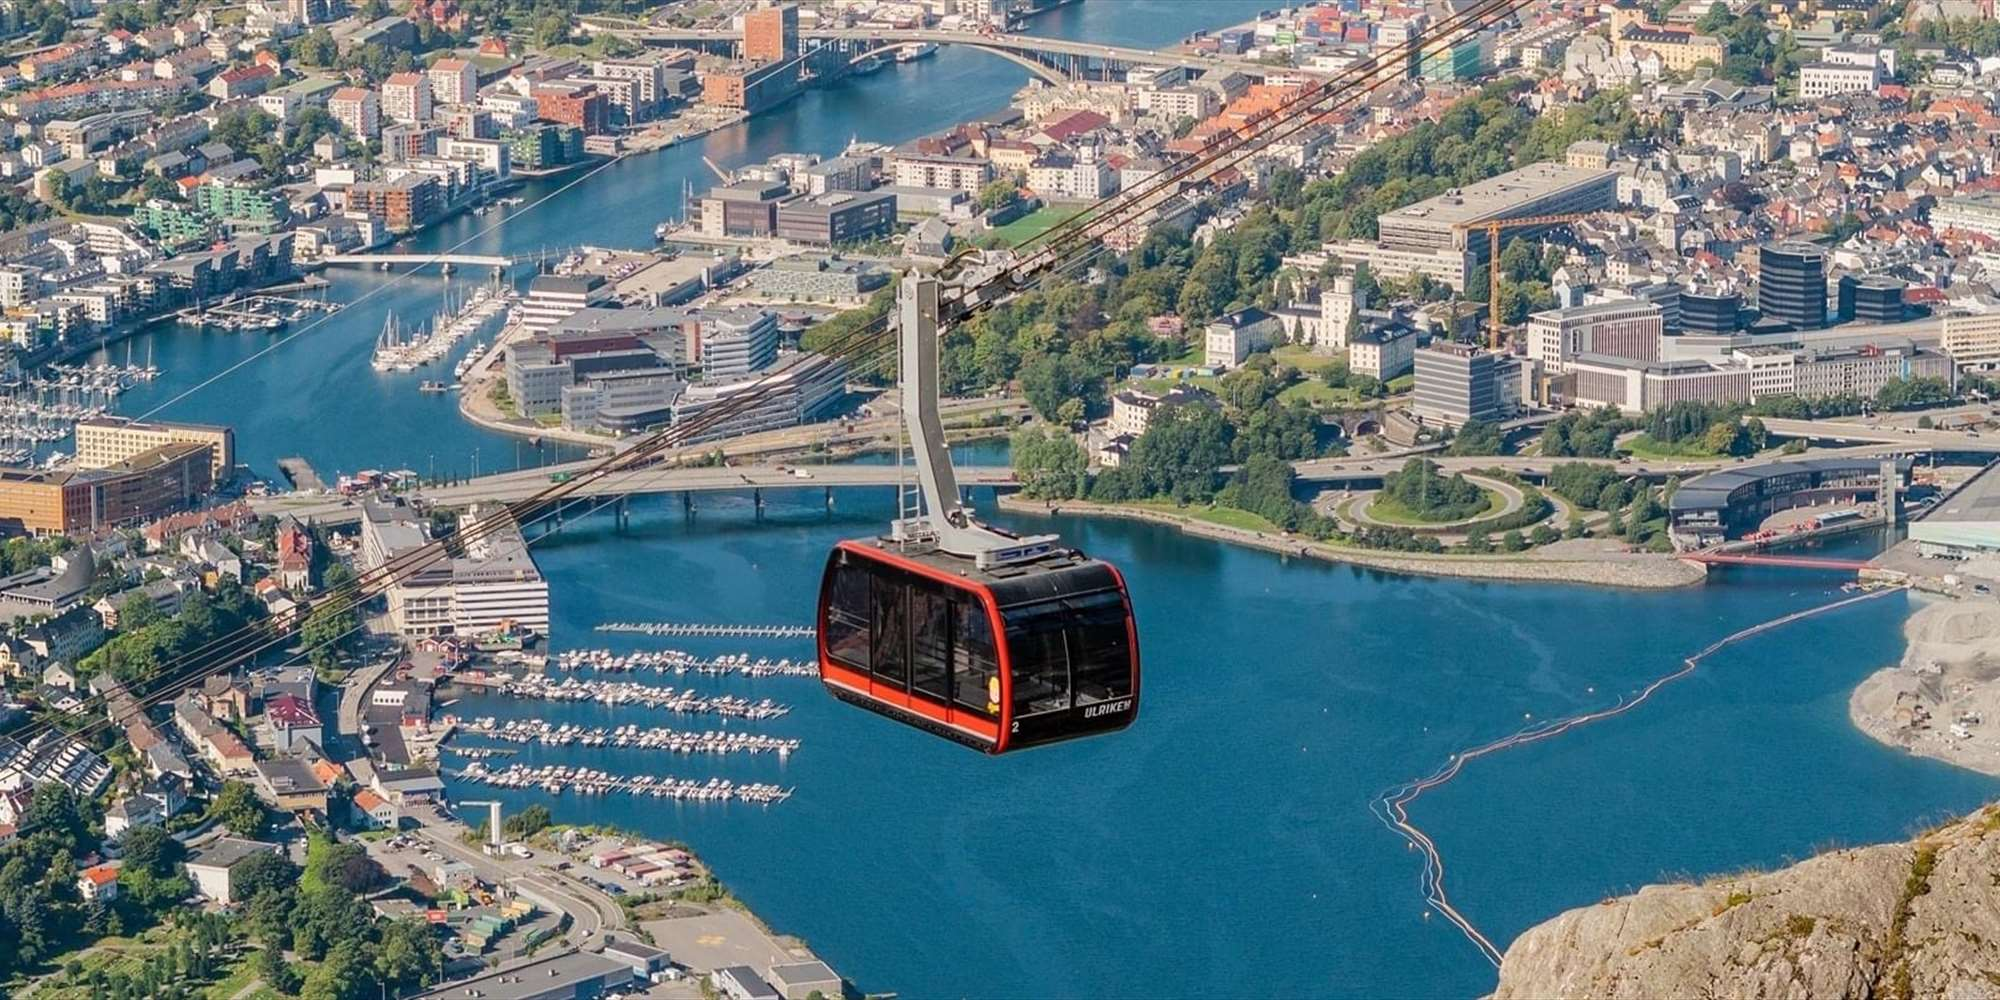 The new Ulriken cable car!